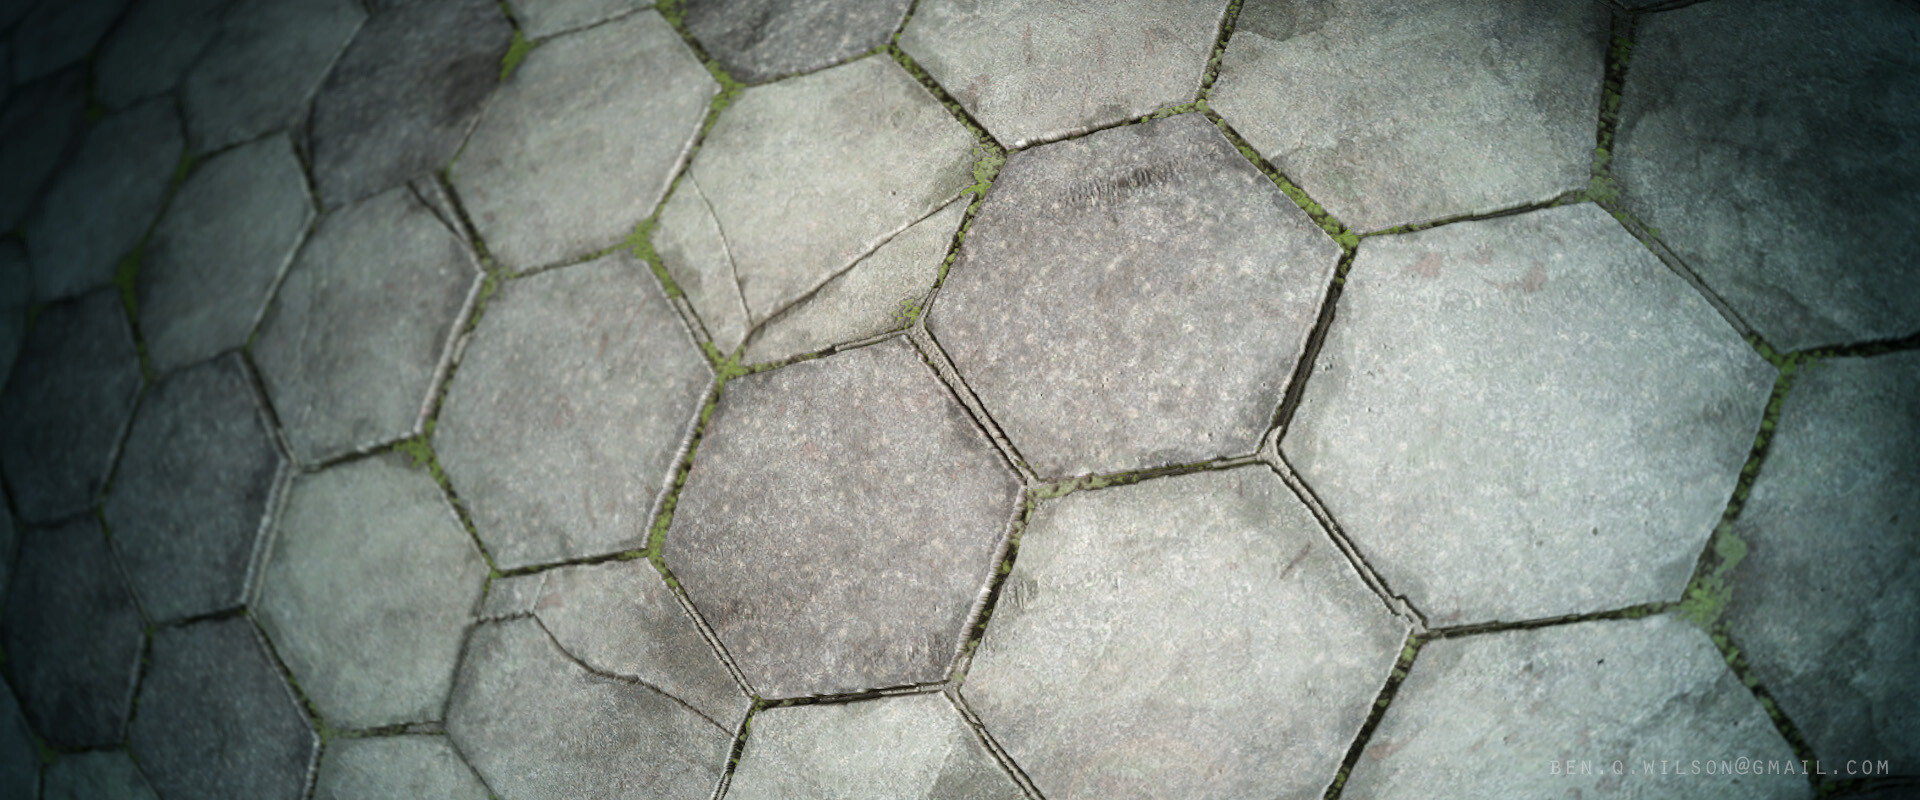 Ben wilson brick hex a render v2 2 2